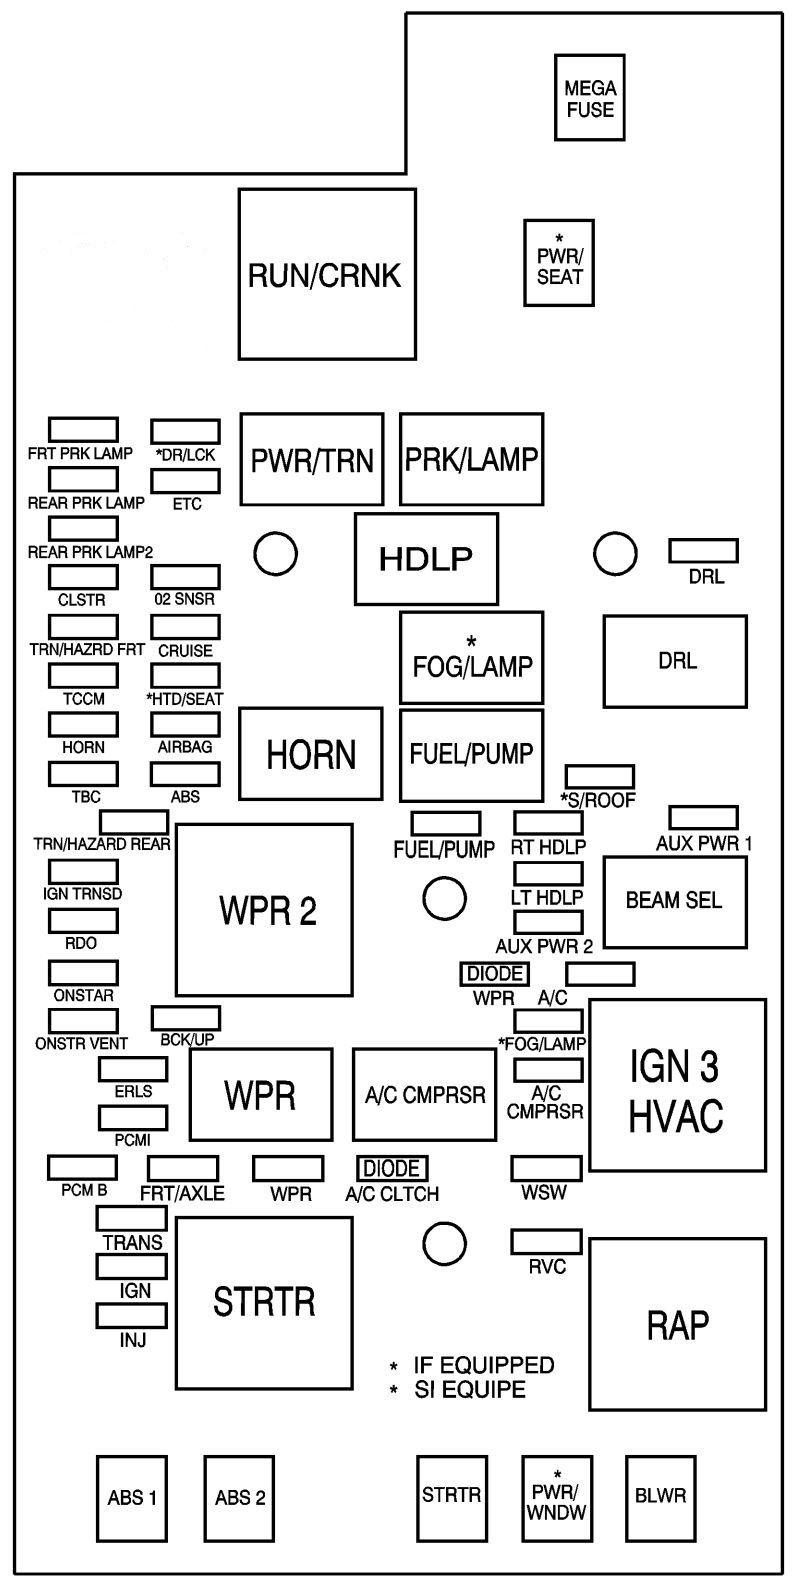 05 gmc canyon fuse diagram et 6534  radio wiring diagram on 2007 chevrolet colorado radio  radio wiring diagram on 2007 chevrolet